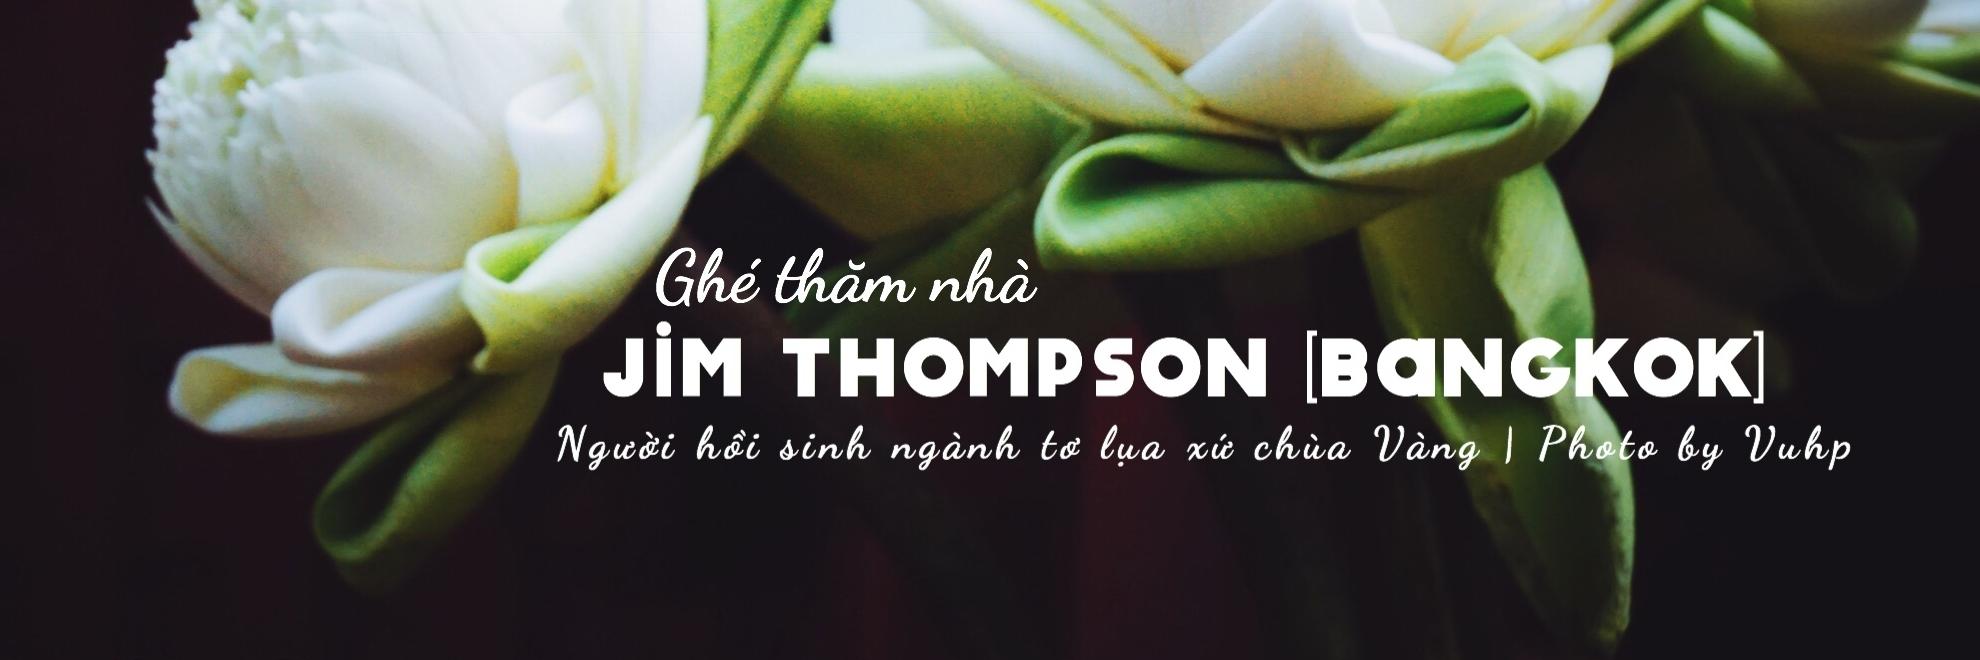 https://gody.vn/blog/phuocvu23089146/post/den-bangkok-ghe-nha-jim-thompson-5064